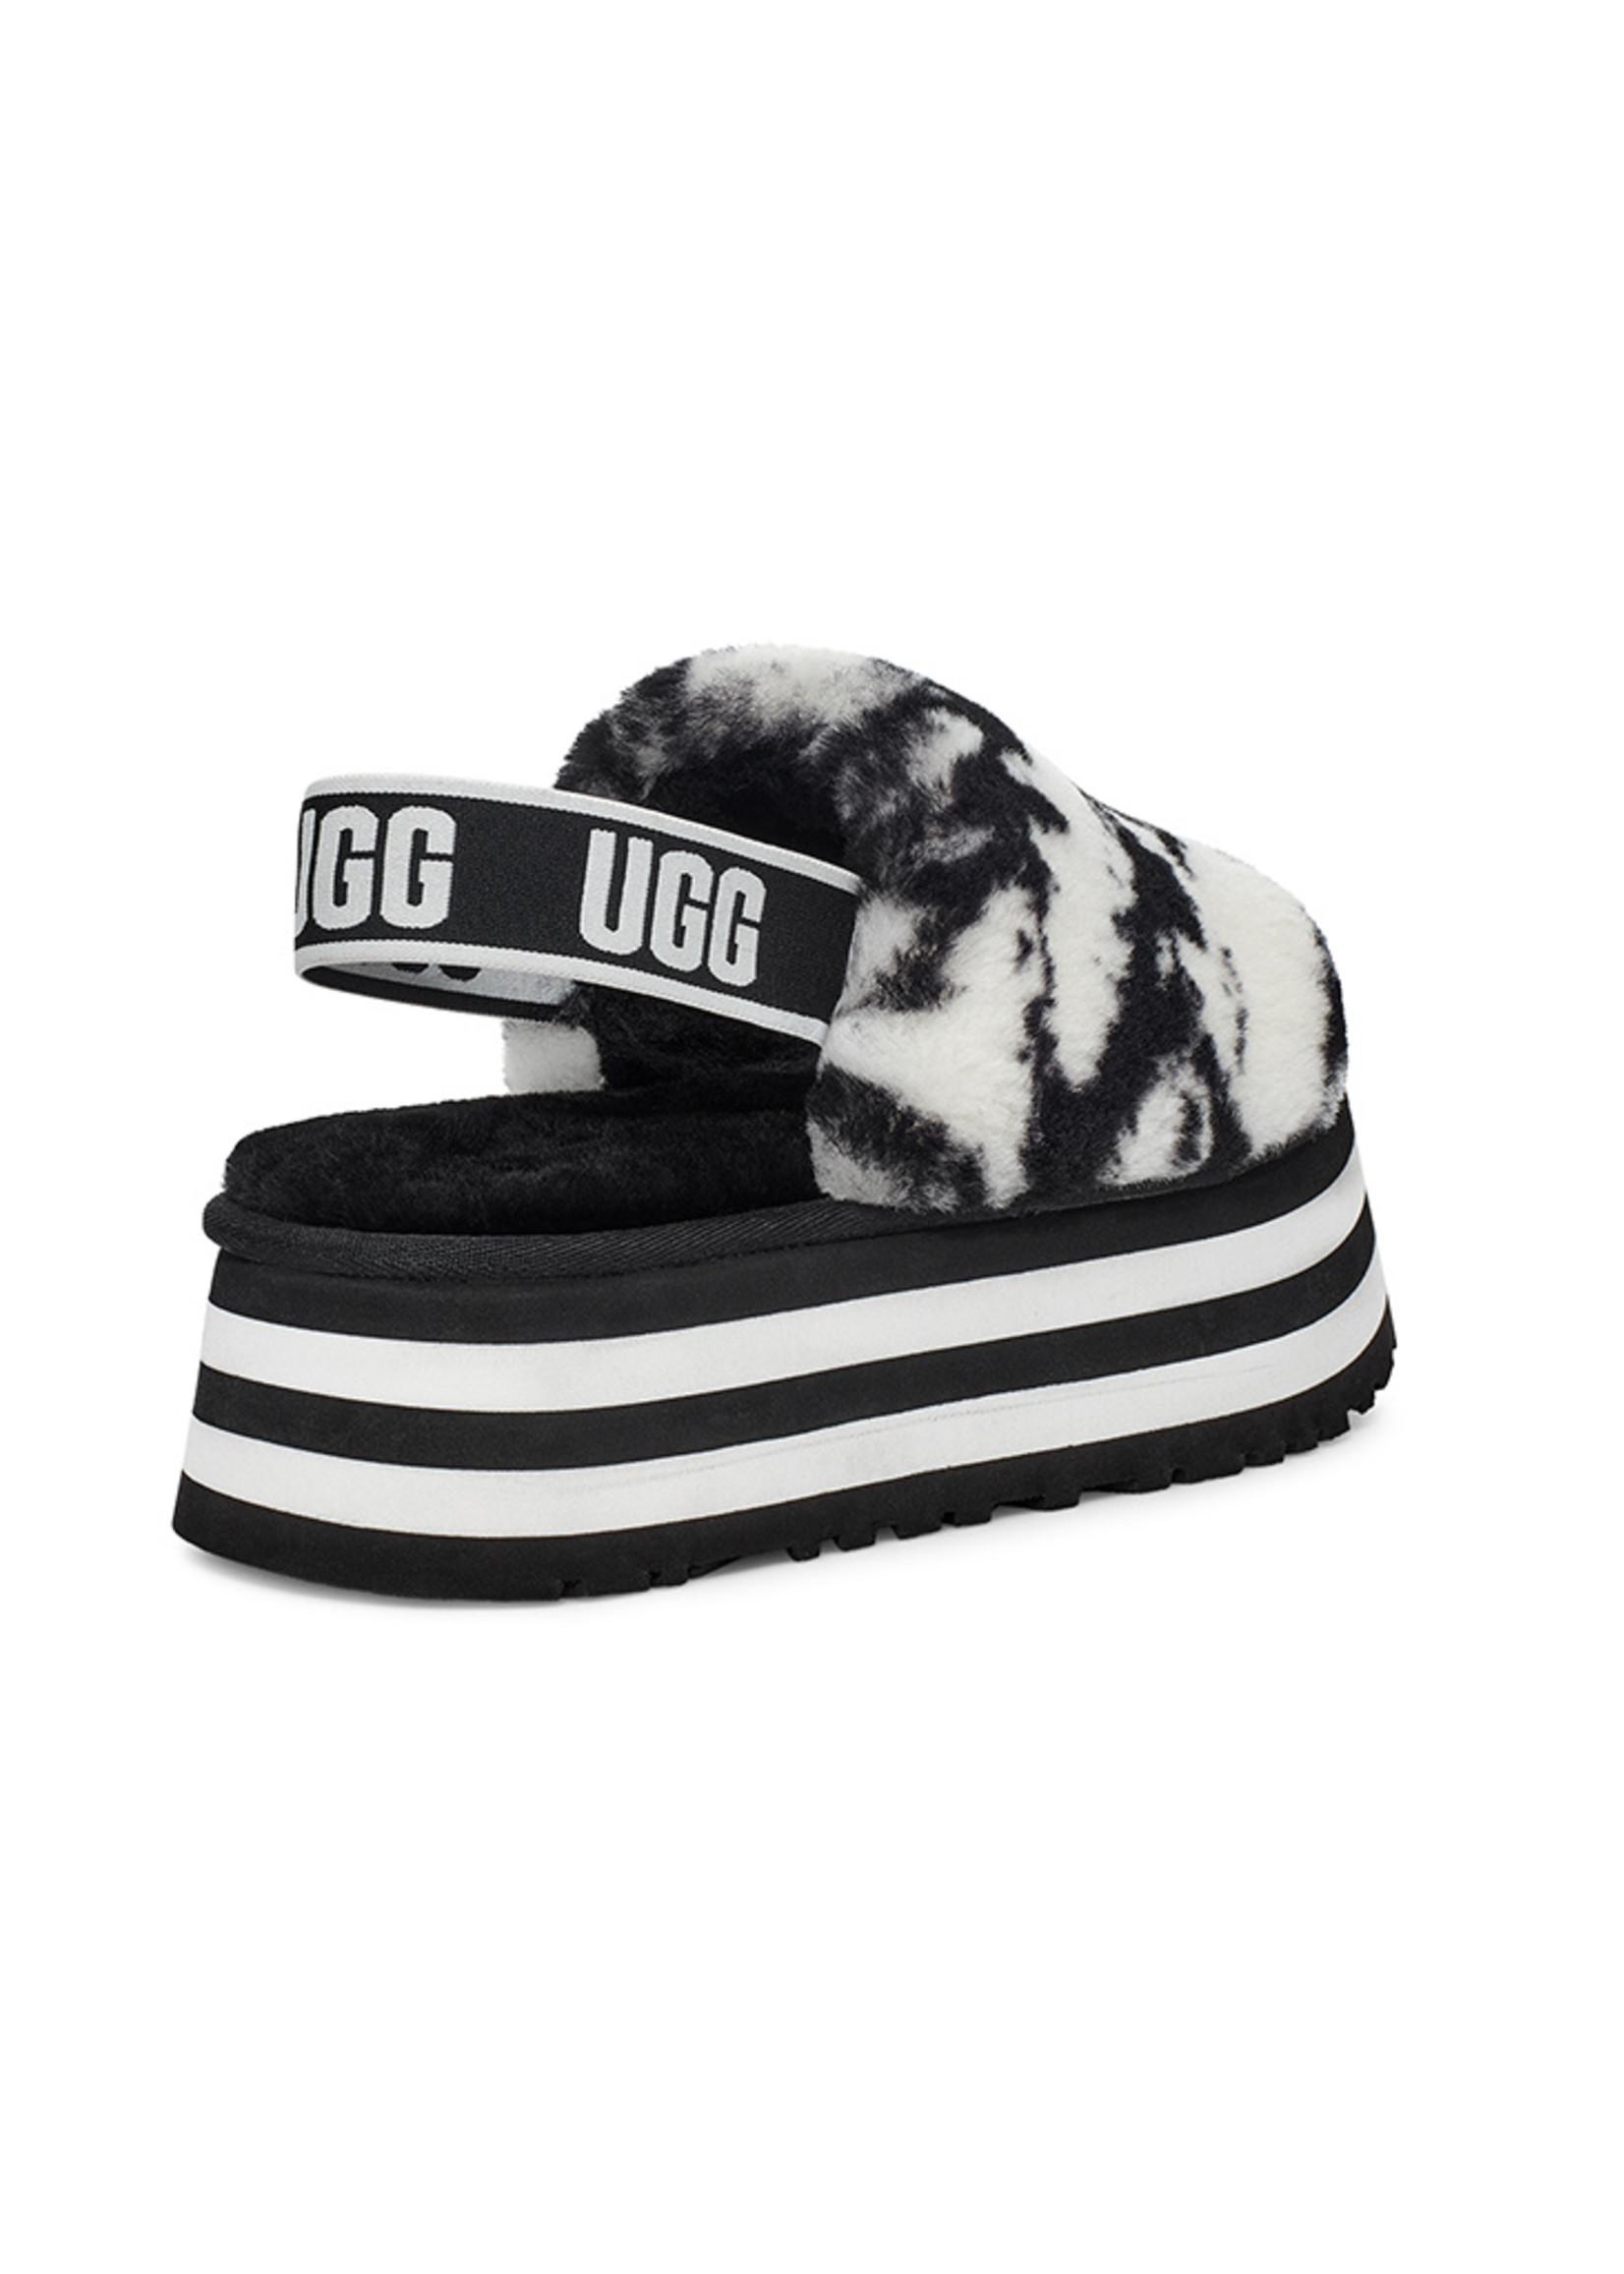 UGG UGG / Women's Disco Marble Slide